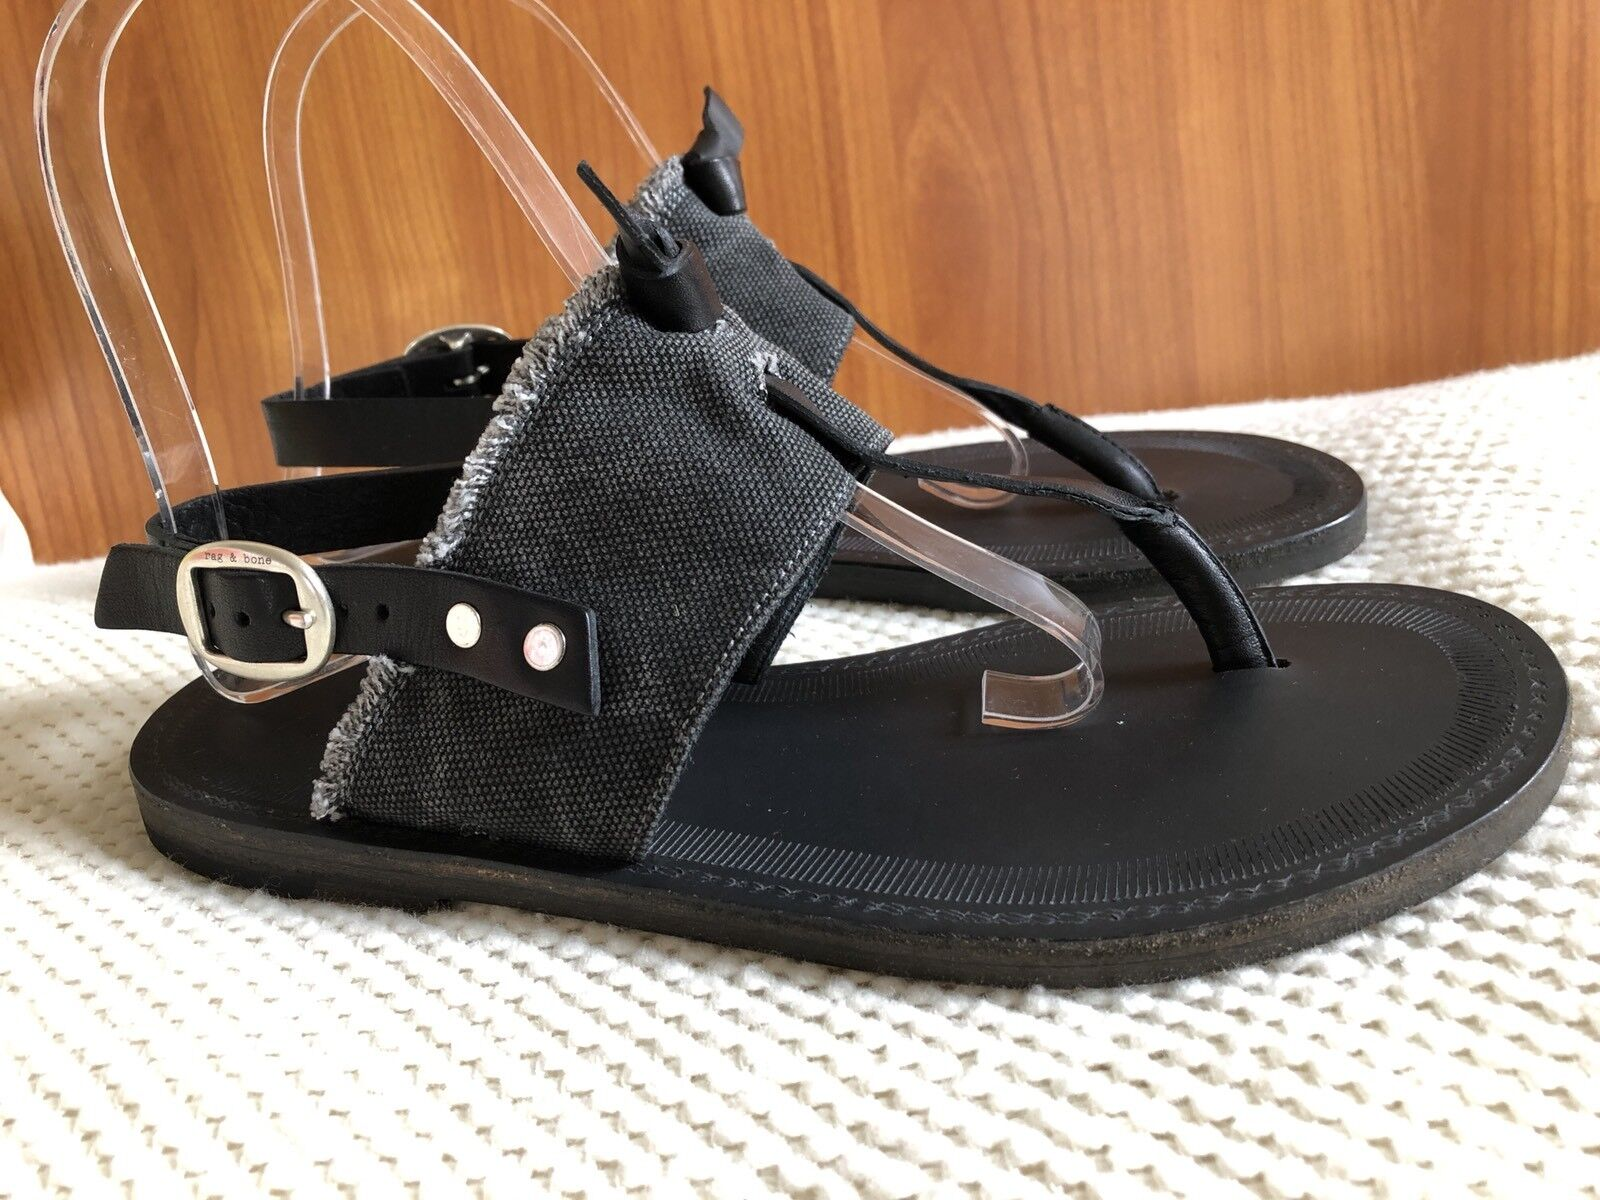 Rag & Bone Claire Black Graphite Leather Canvas Sandals New Size 6 (36)